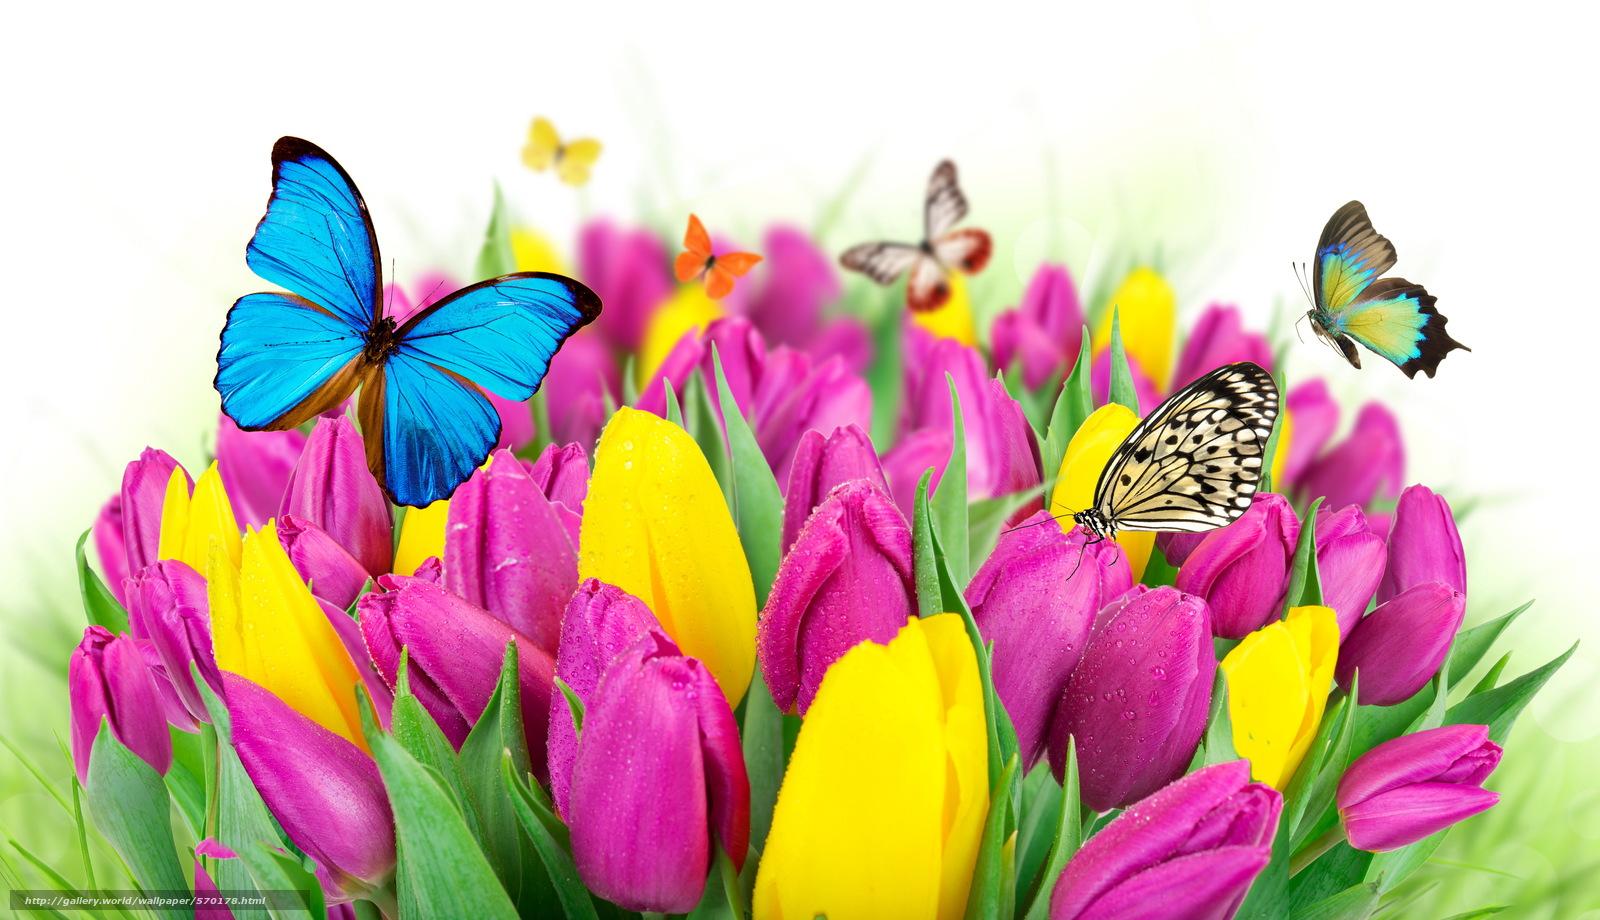 Tlcharger fond d 39 ecran papillons spring fleurs tulipes for Sfondi desktop gratis primavera